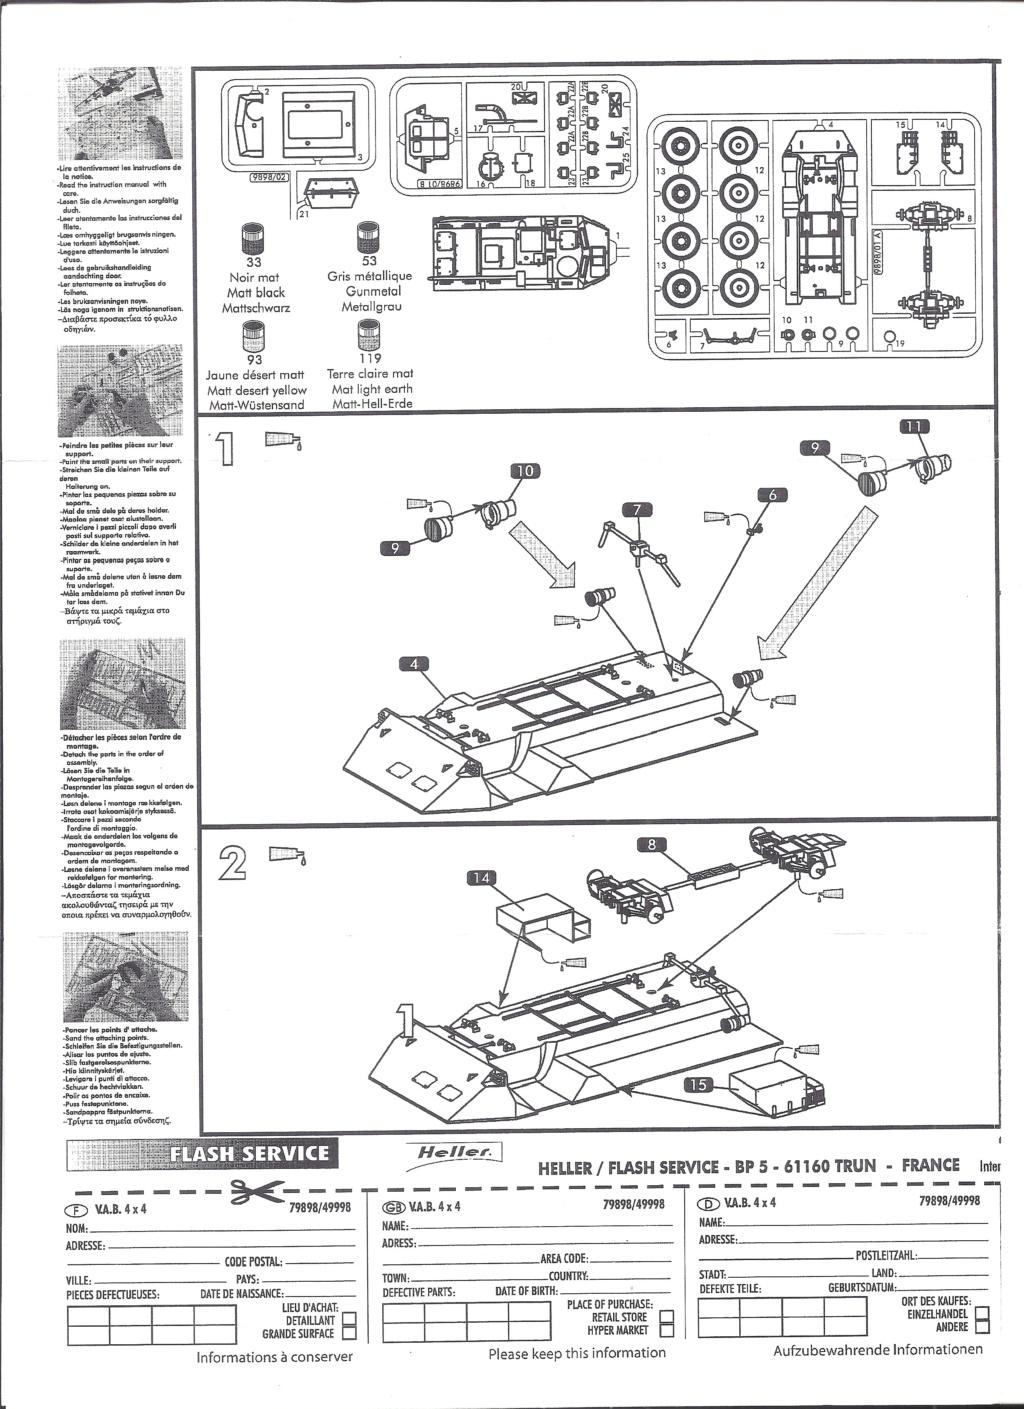 RENAULT VAB 4X4 1/72ème Ref 79898 Notice Helle382